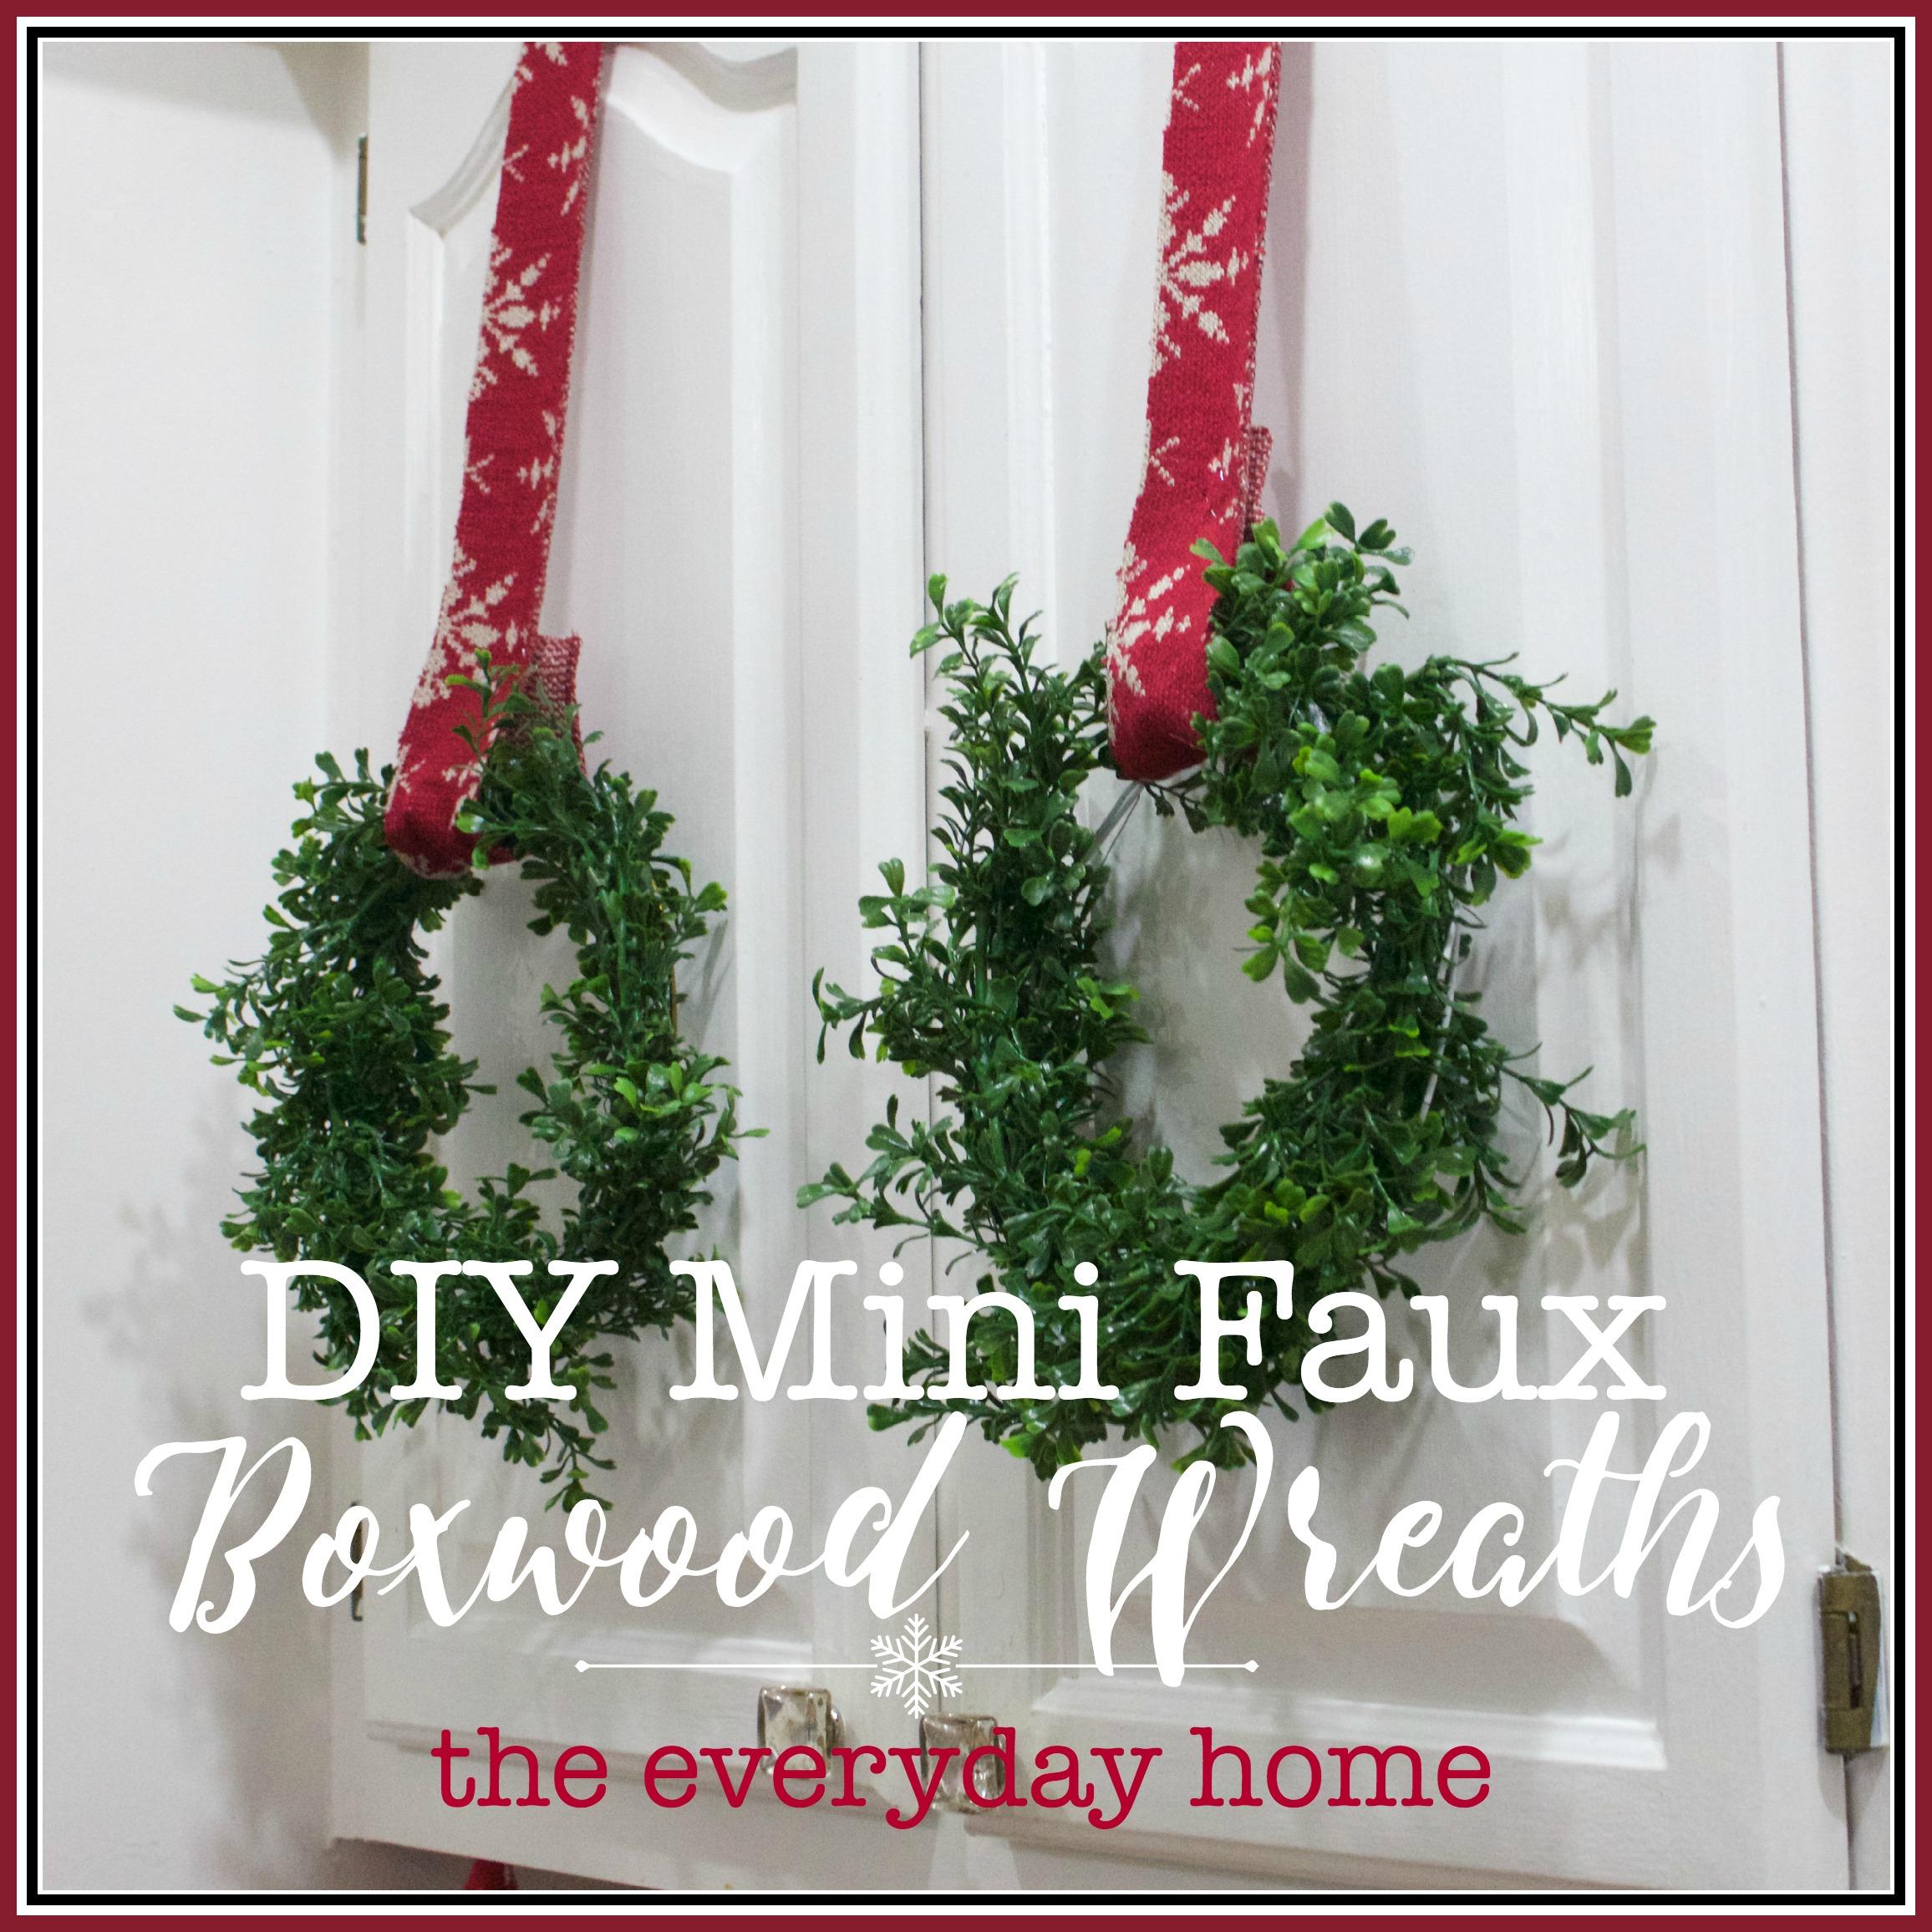 DIY Mini Faux Boxwood Wreaths